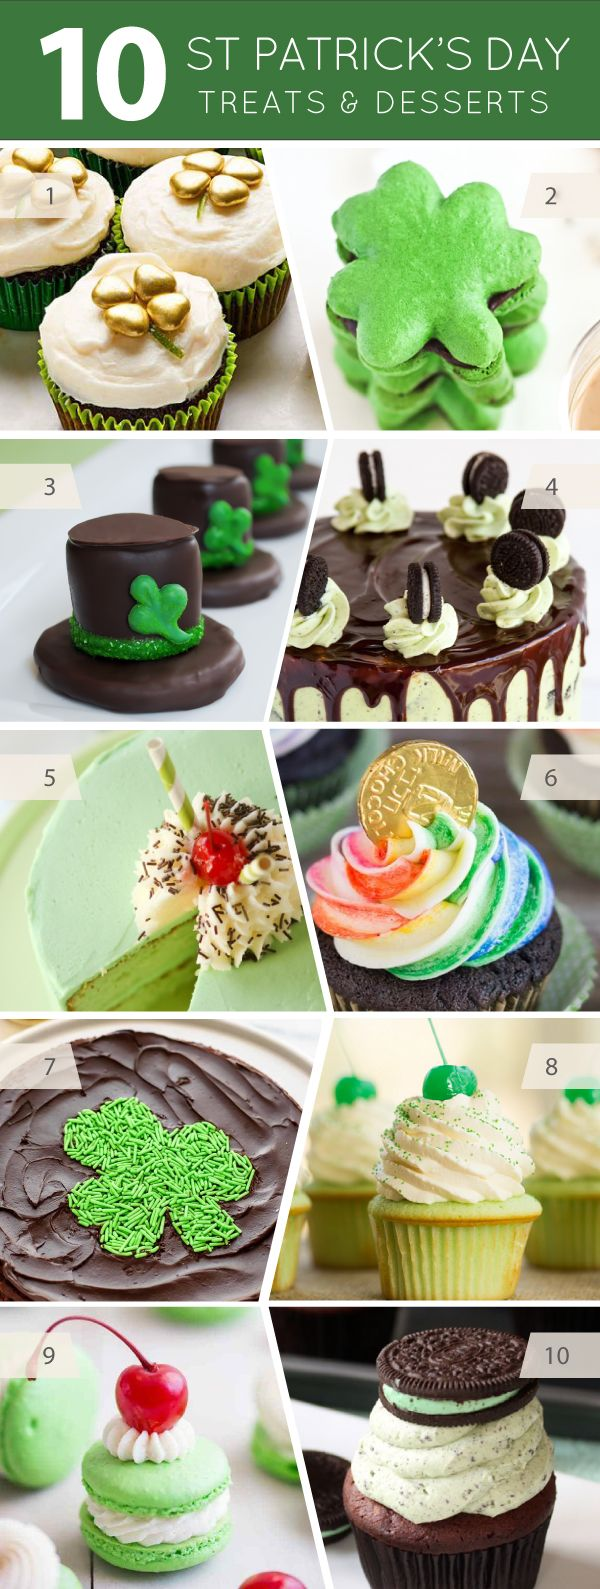 10 St. Patrick's Day Treats and Desserts | on TheCakeBlog.com